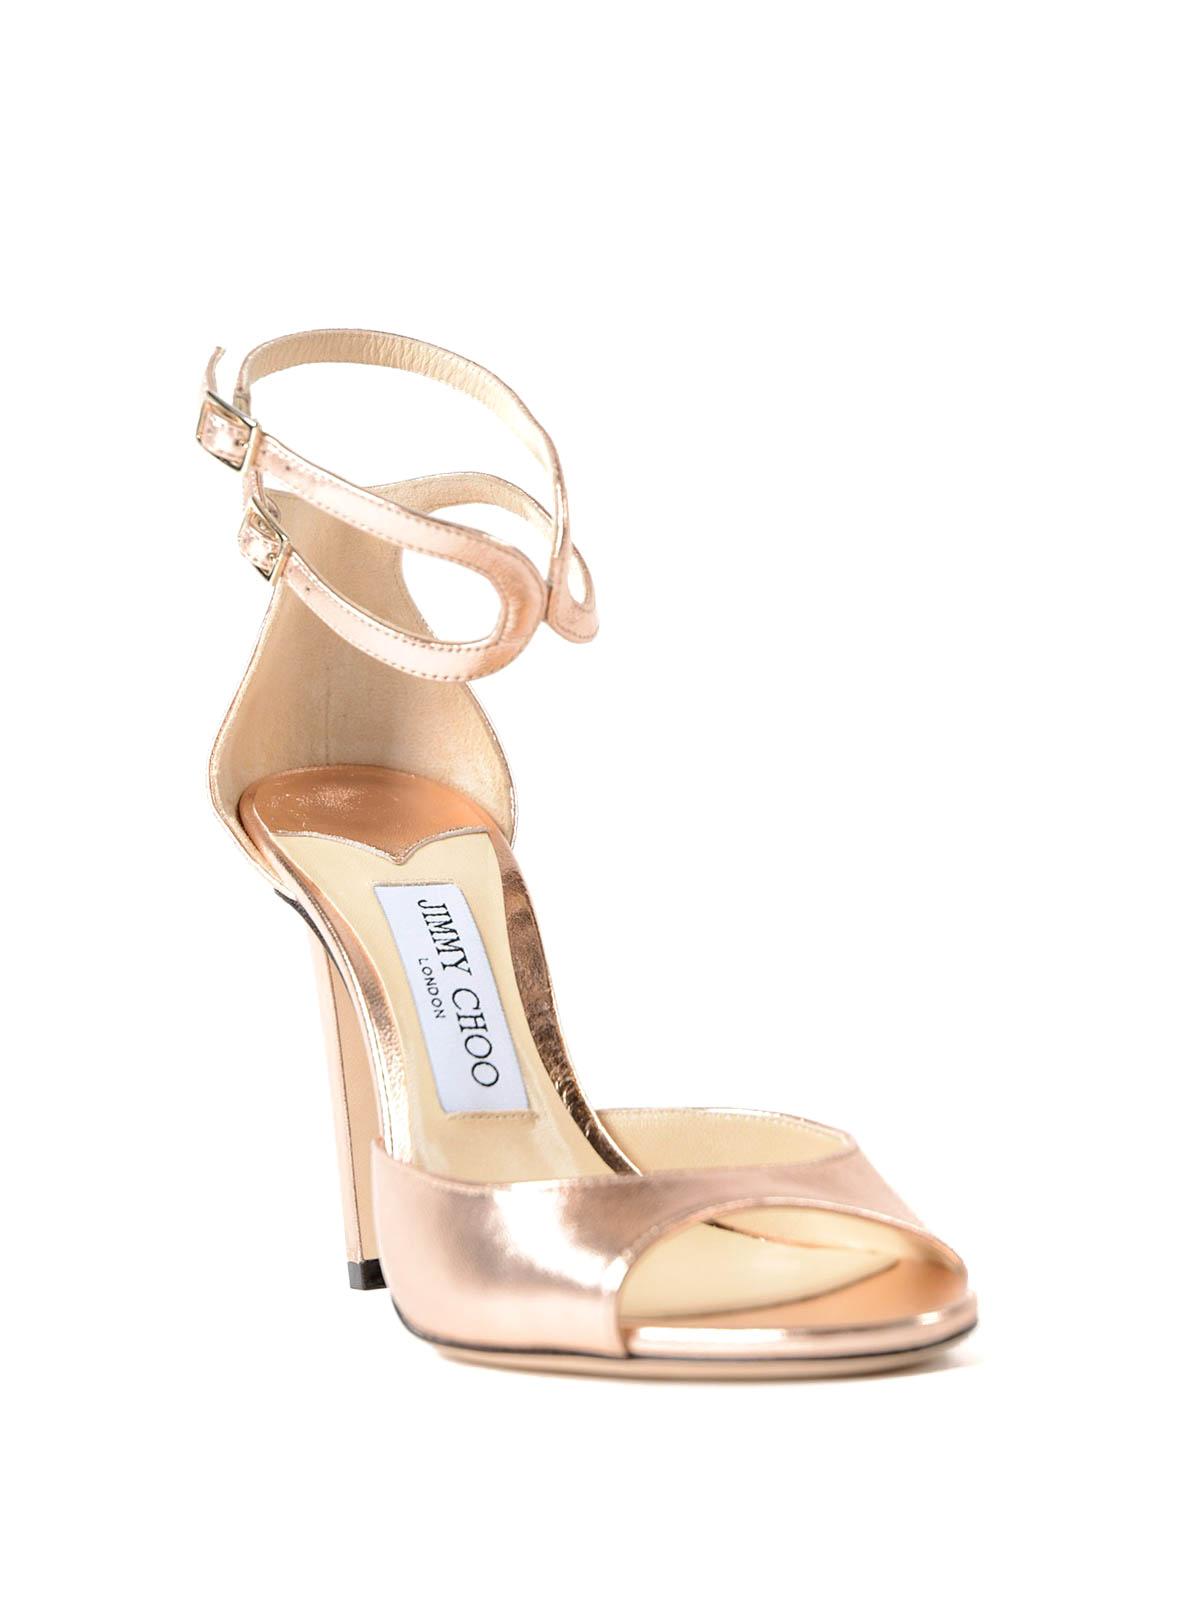 9516c485db2 Jimmy Choo - Lane 100 leather sandals - sandals - LANE100MEATEA